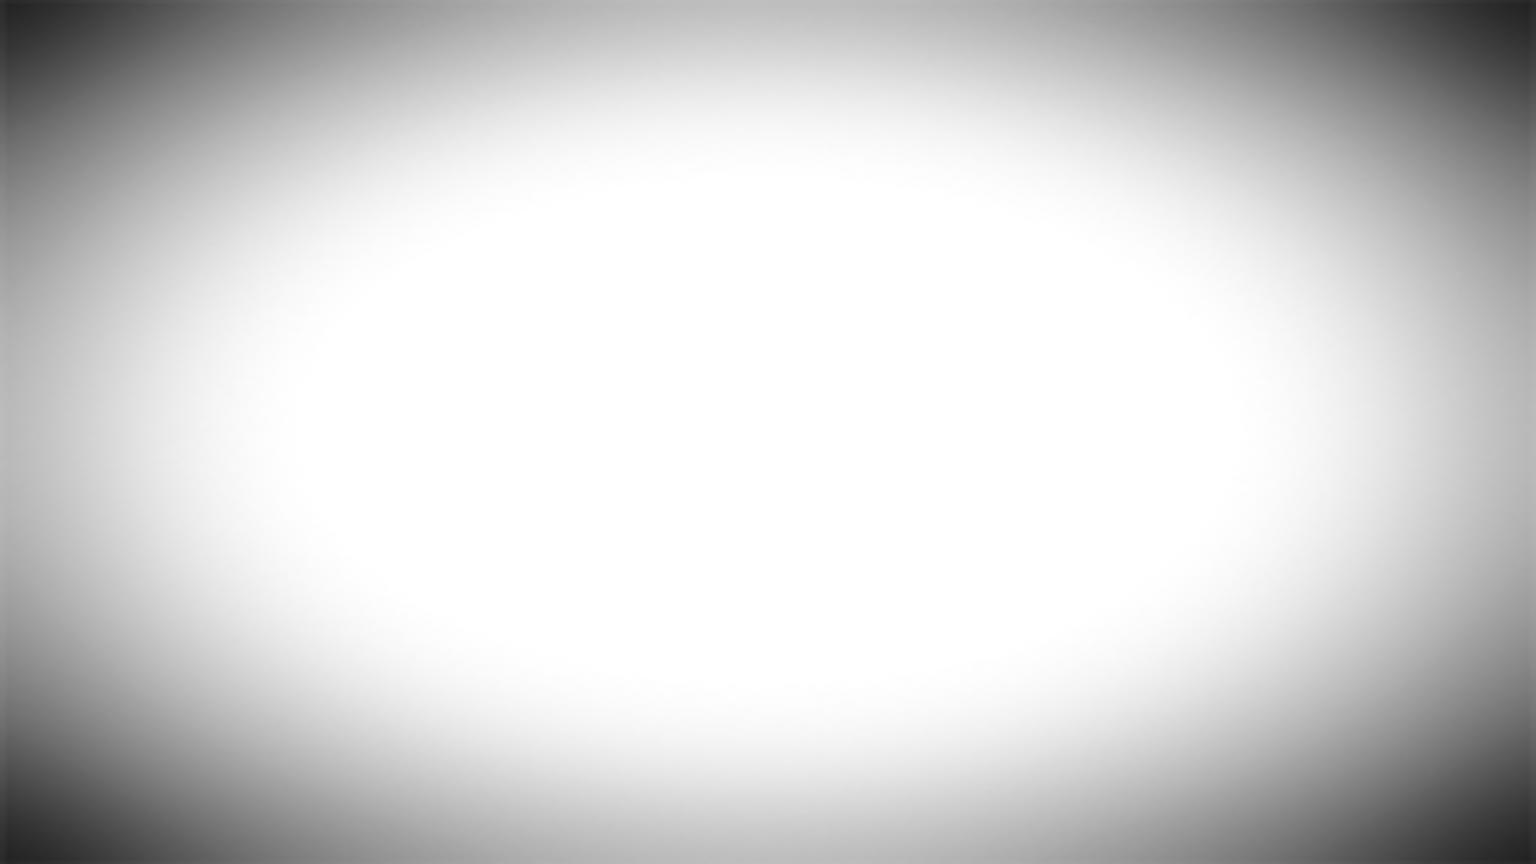 Реверс-инжиниринг рендеринга «Ведьмака 3» - 18